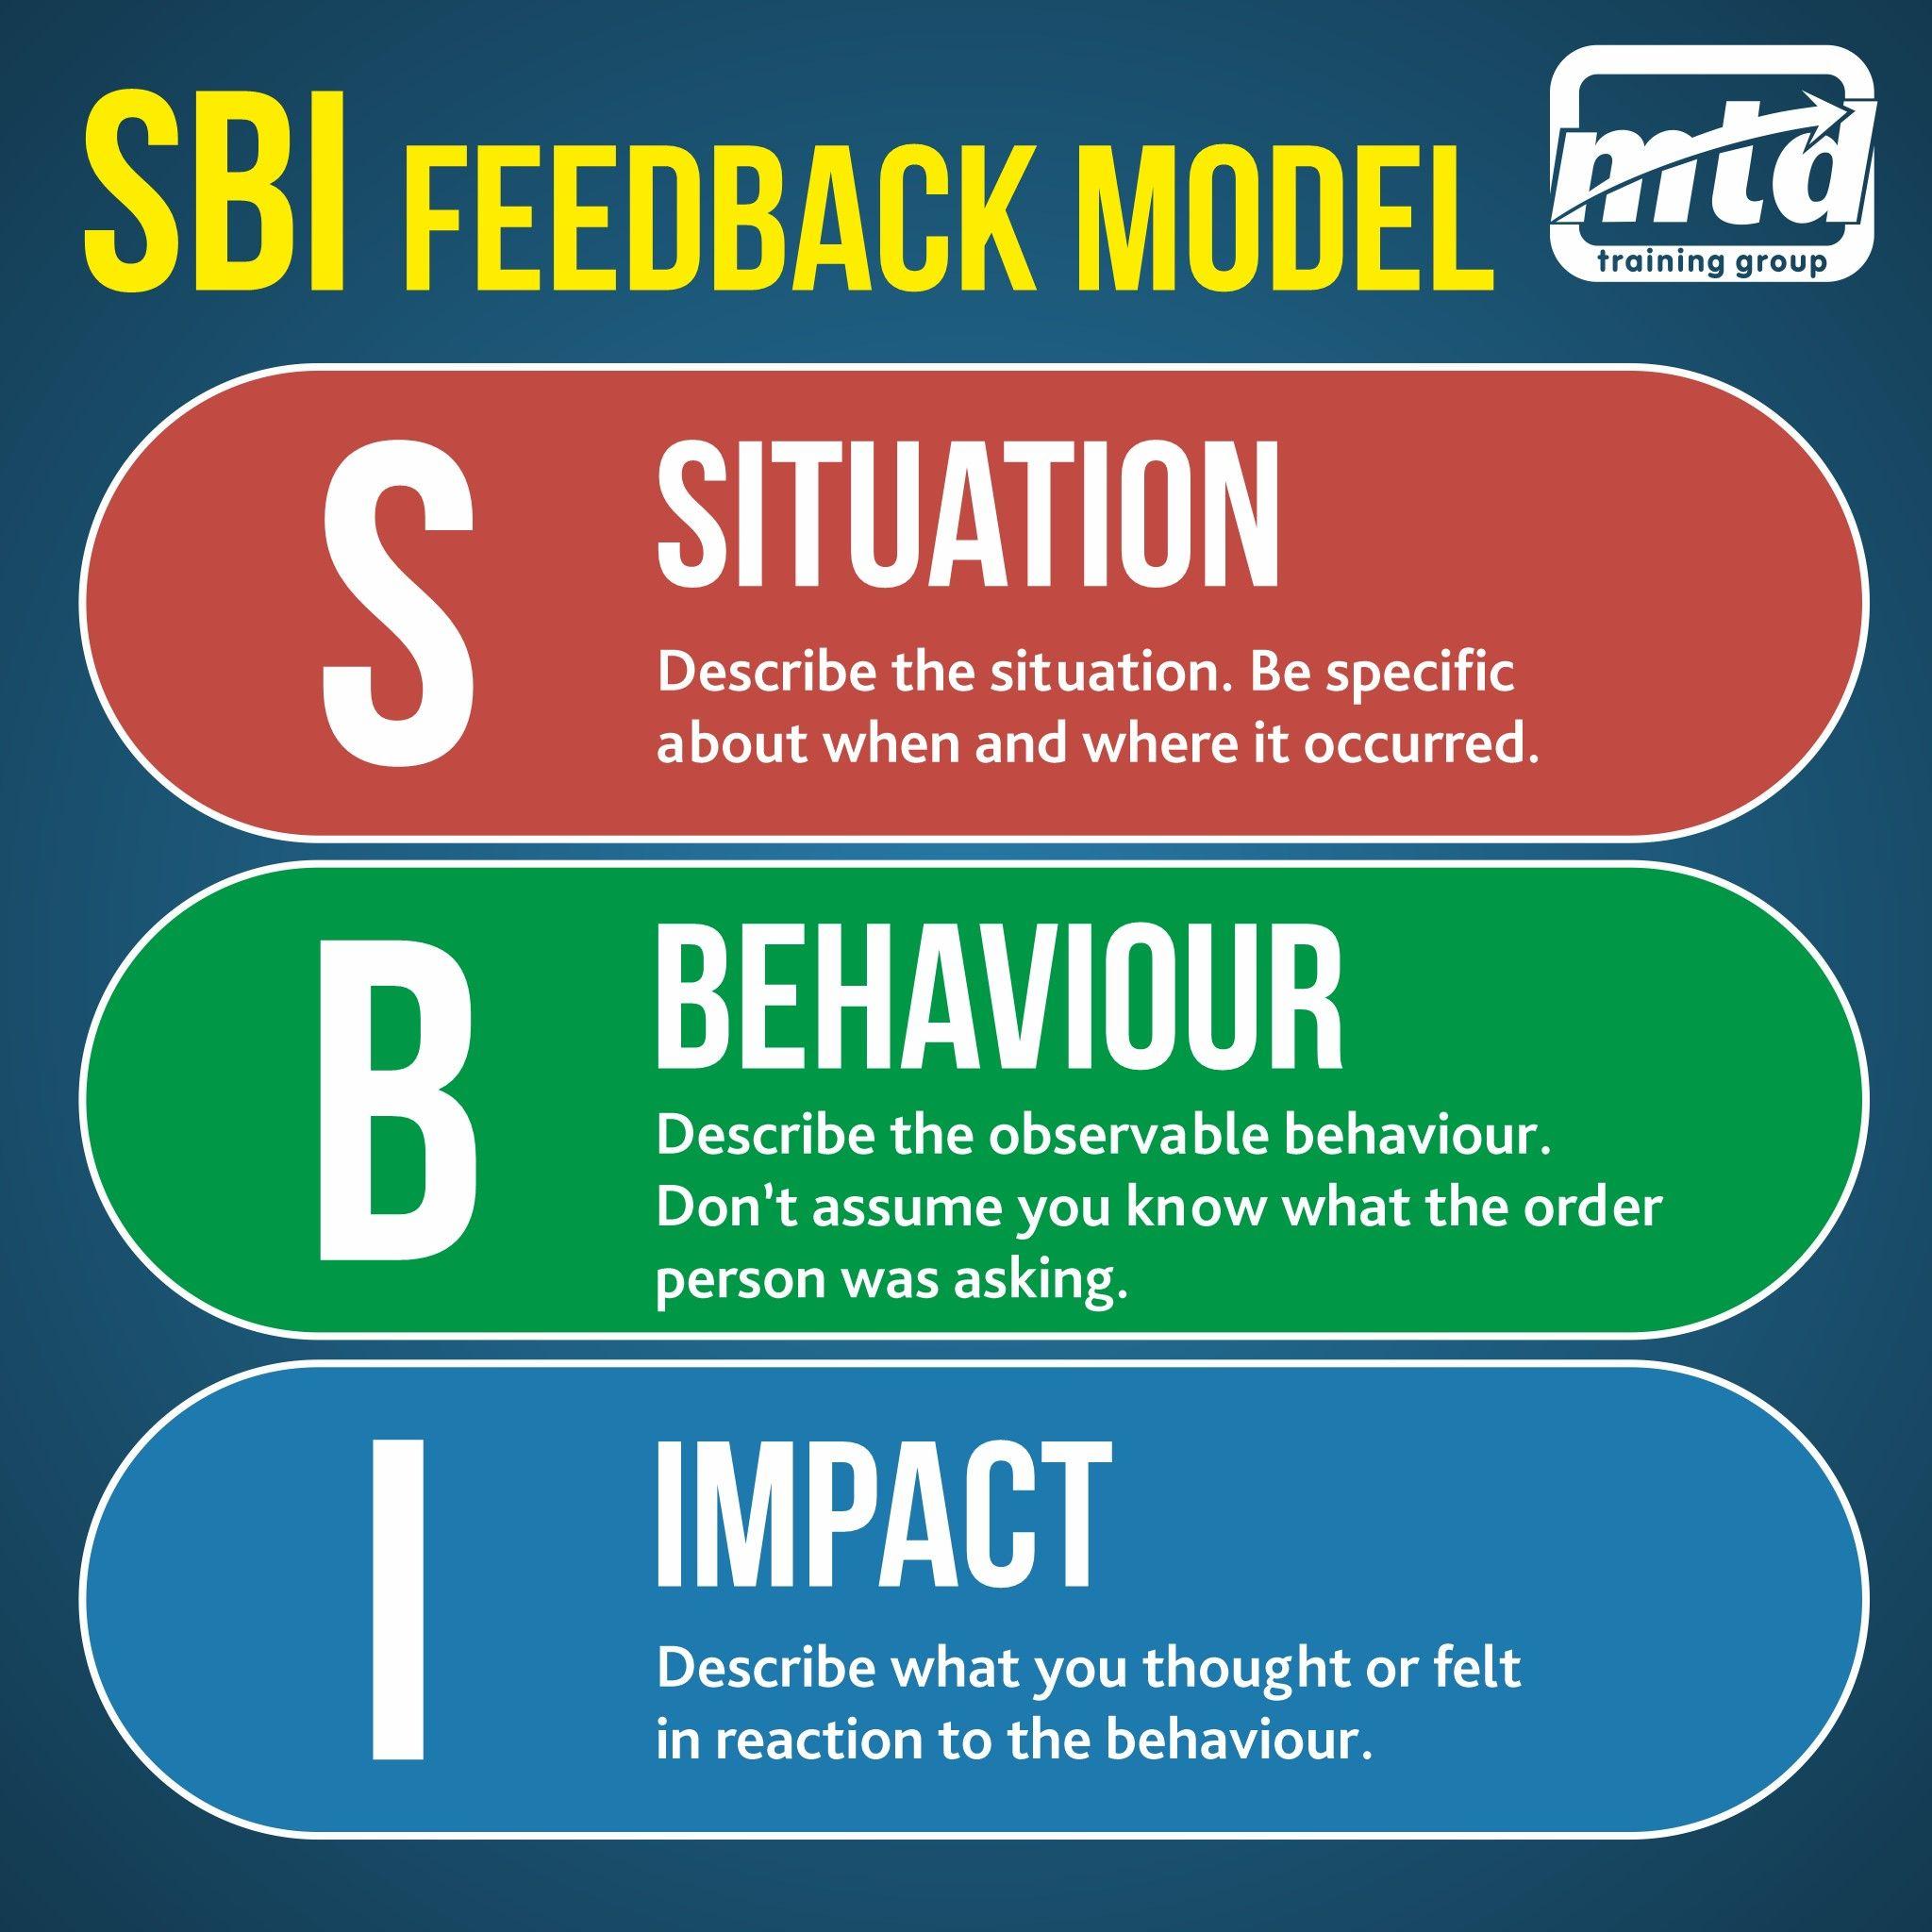 The Sbi Feedback Model In